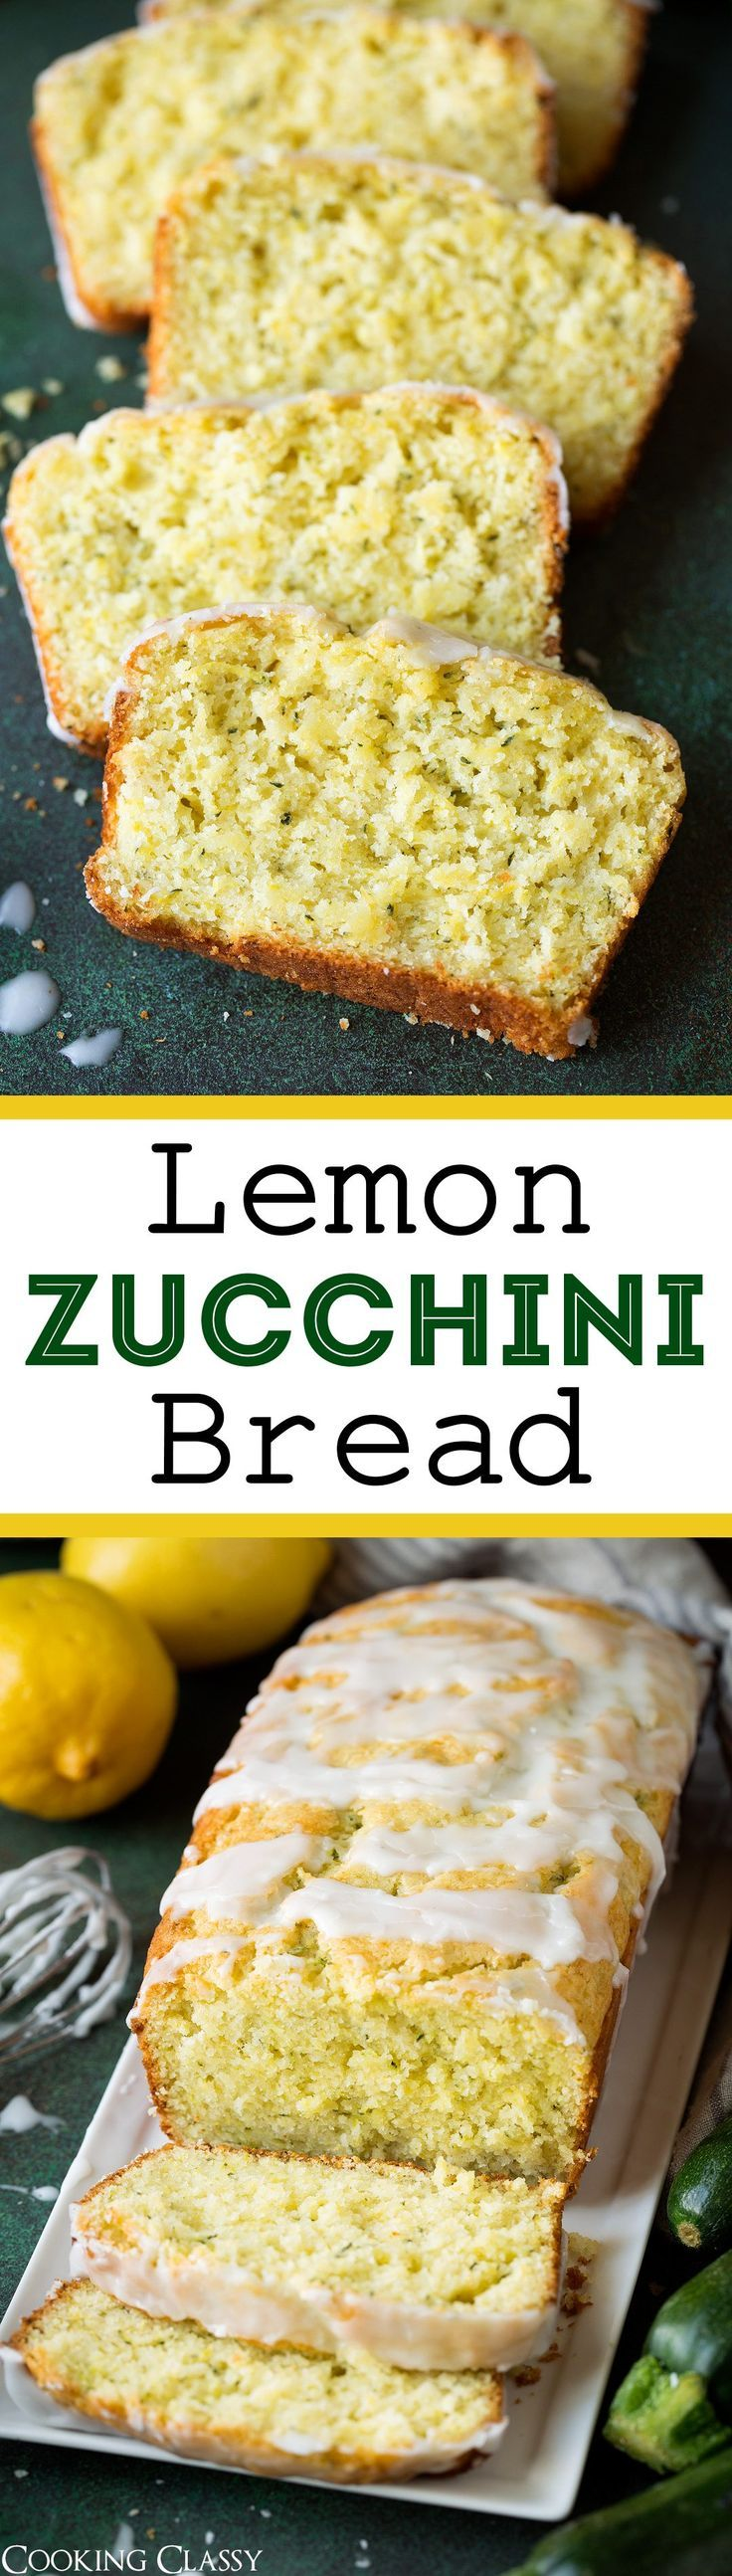 Lemon Zucchini Bread - Cooking Classy